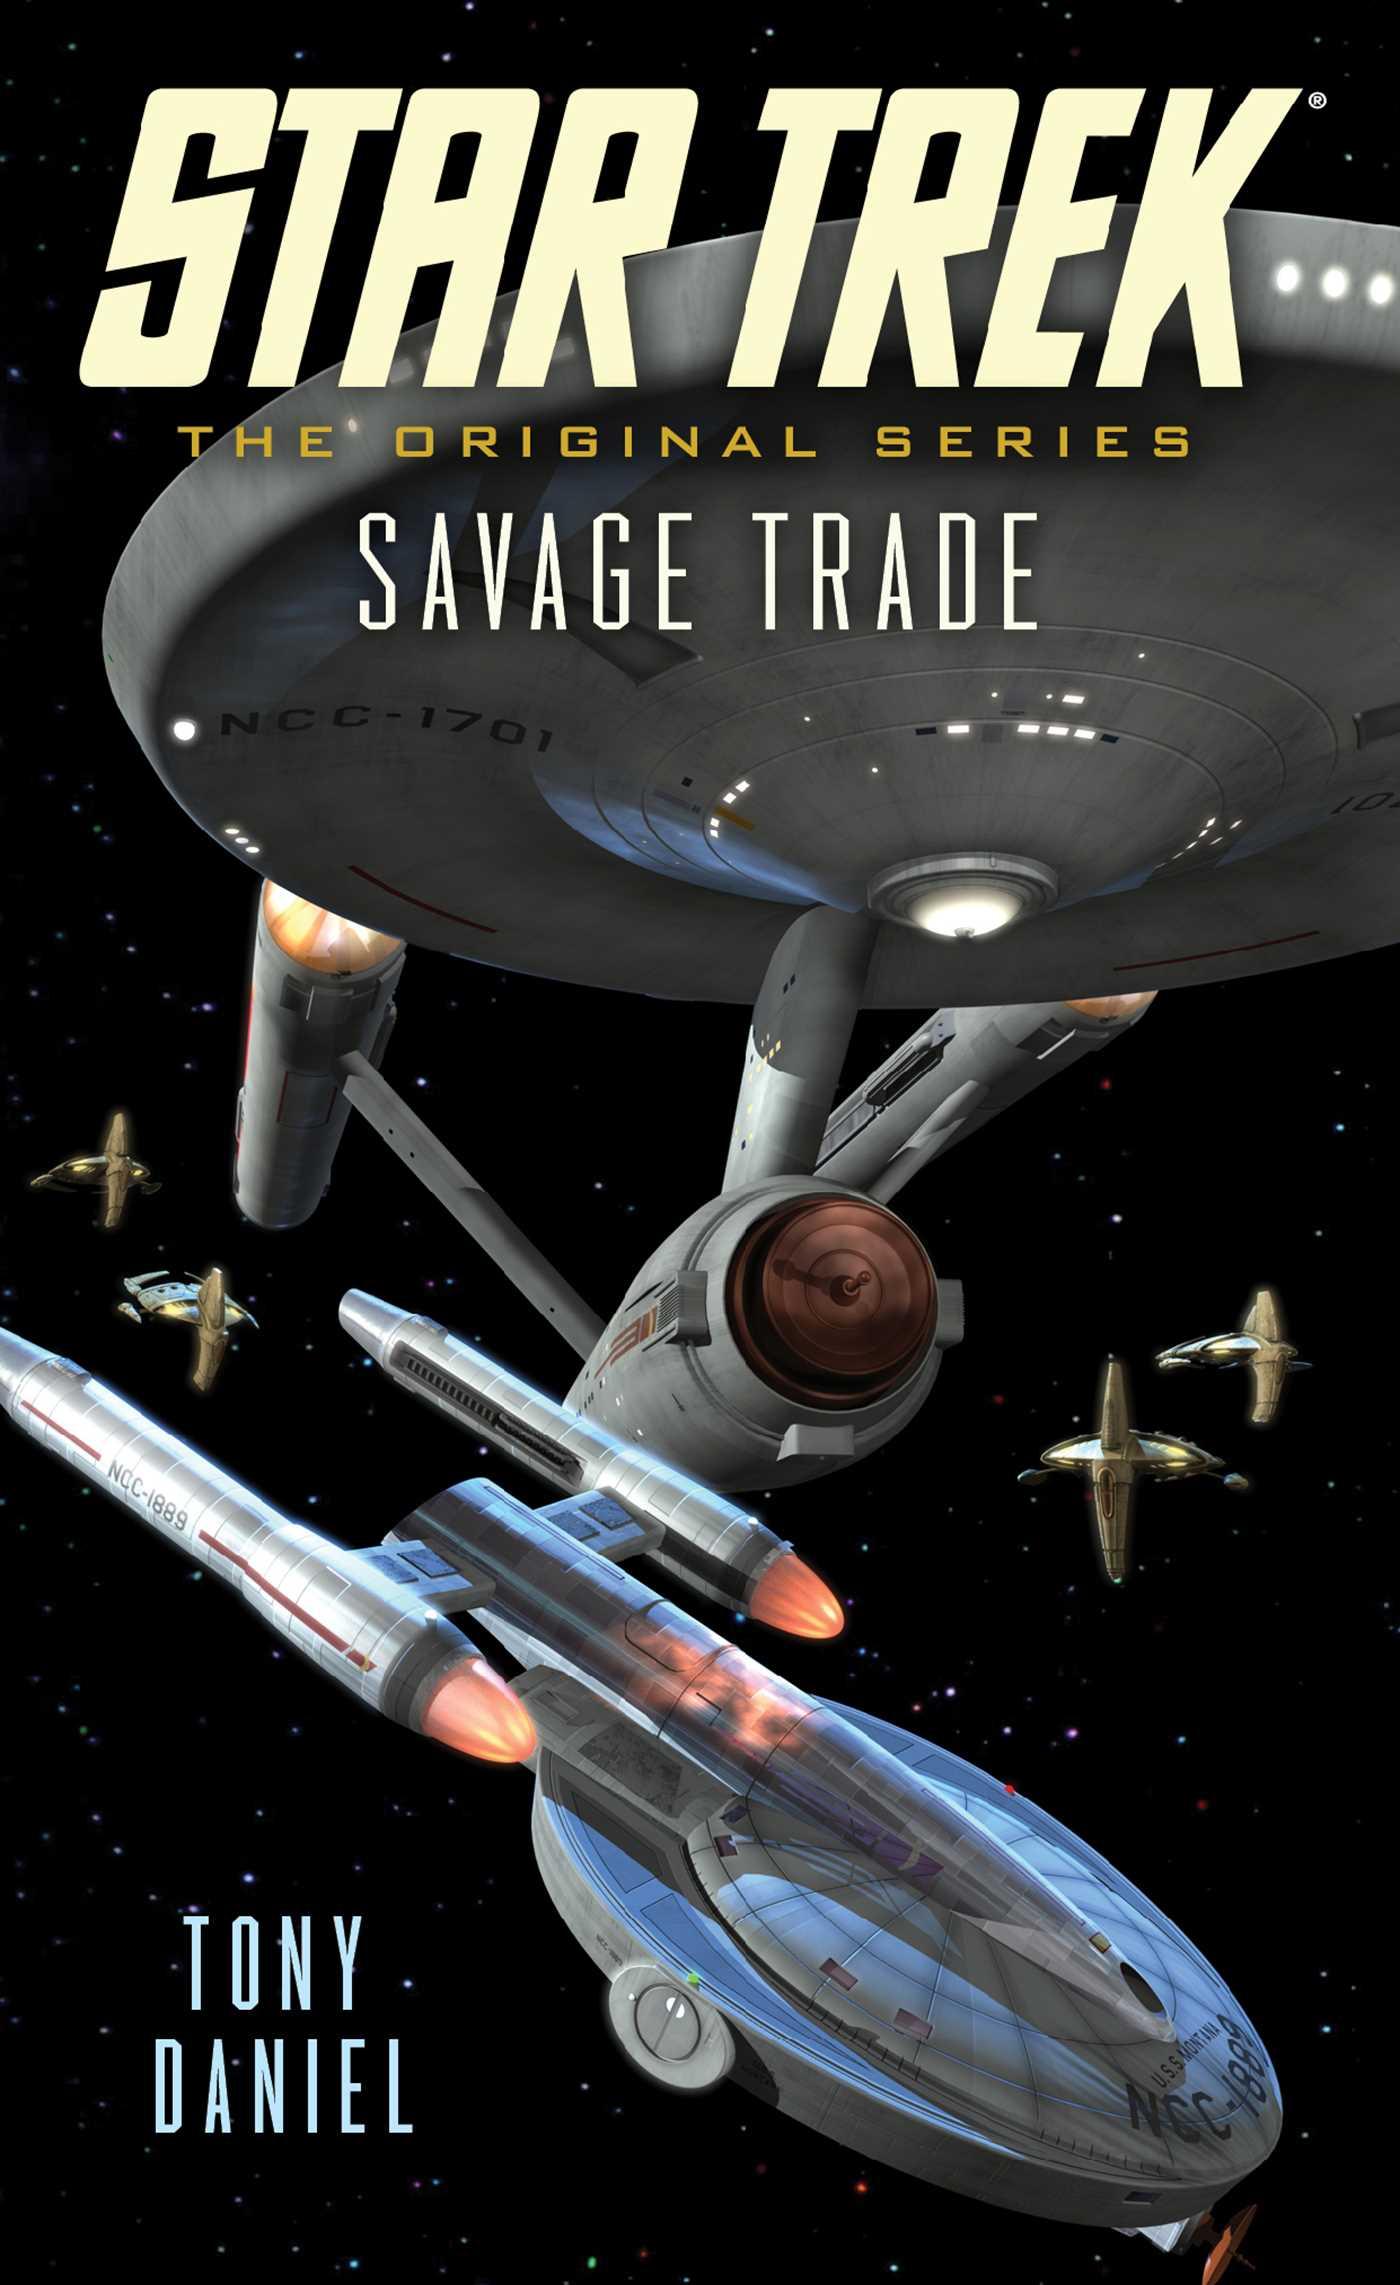 Star trek the original series savage trade 9781476765501 hr